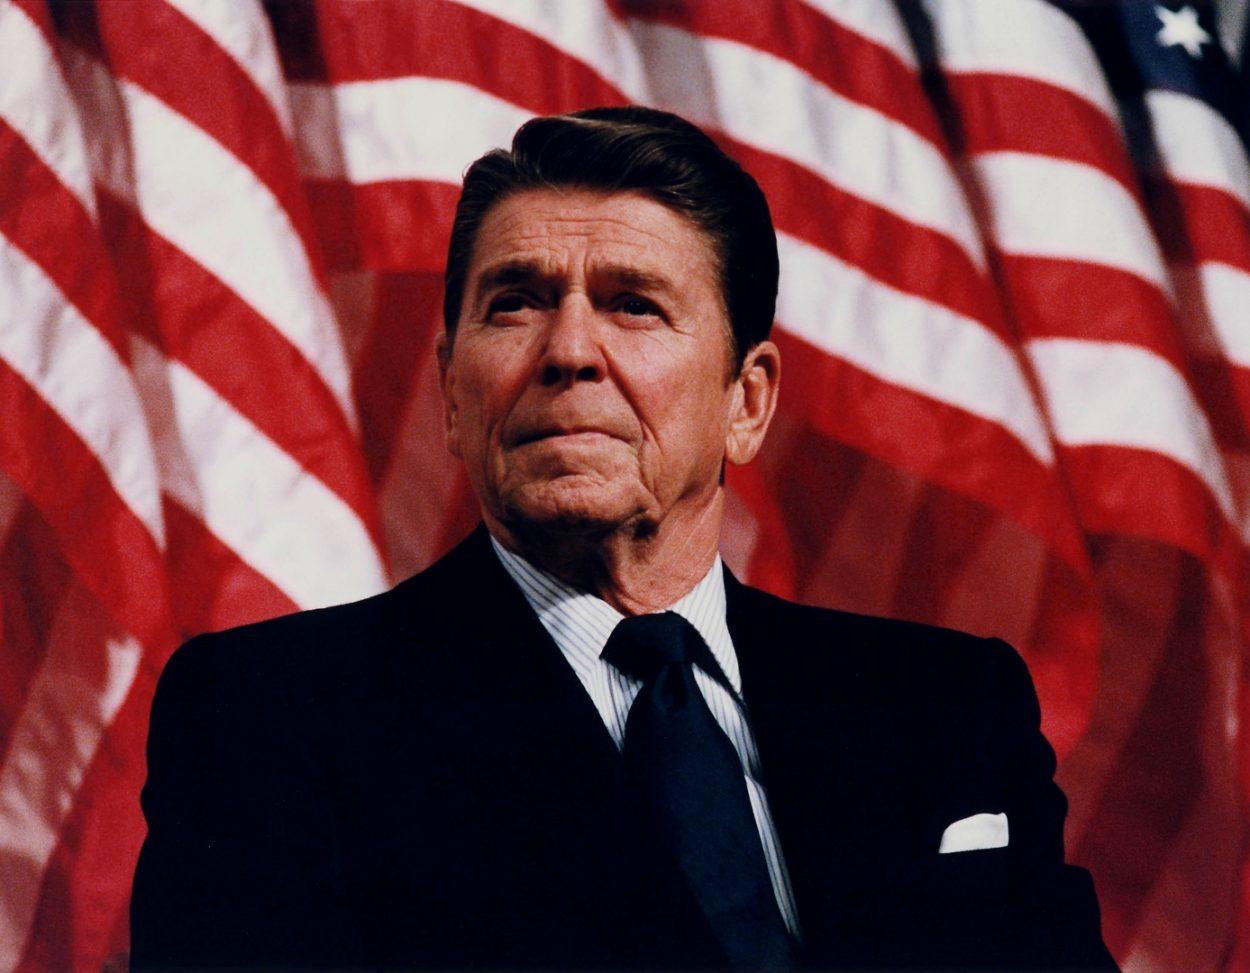 Впечатляющая реакция Рейгана налопнувший шарик